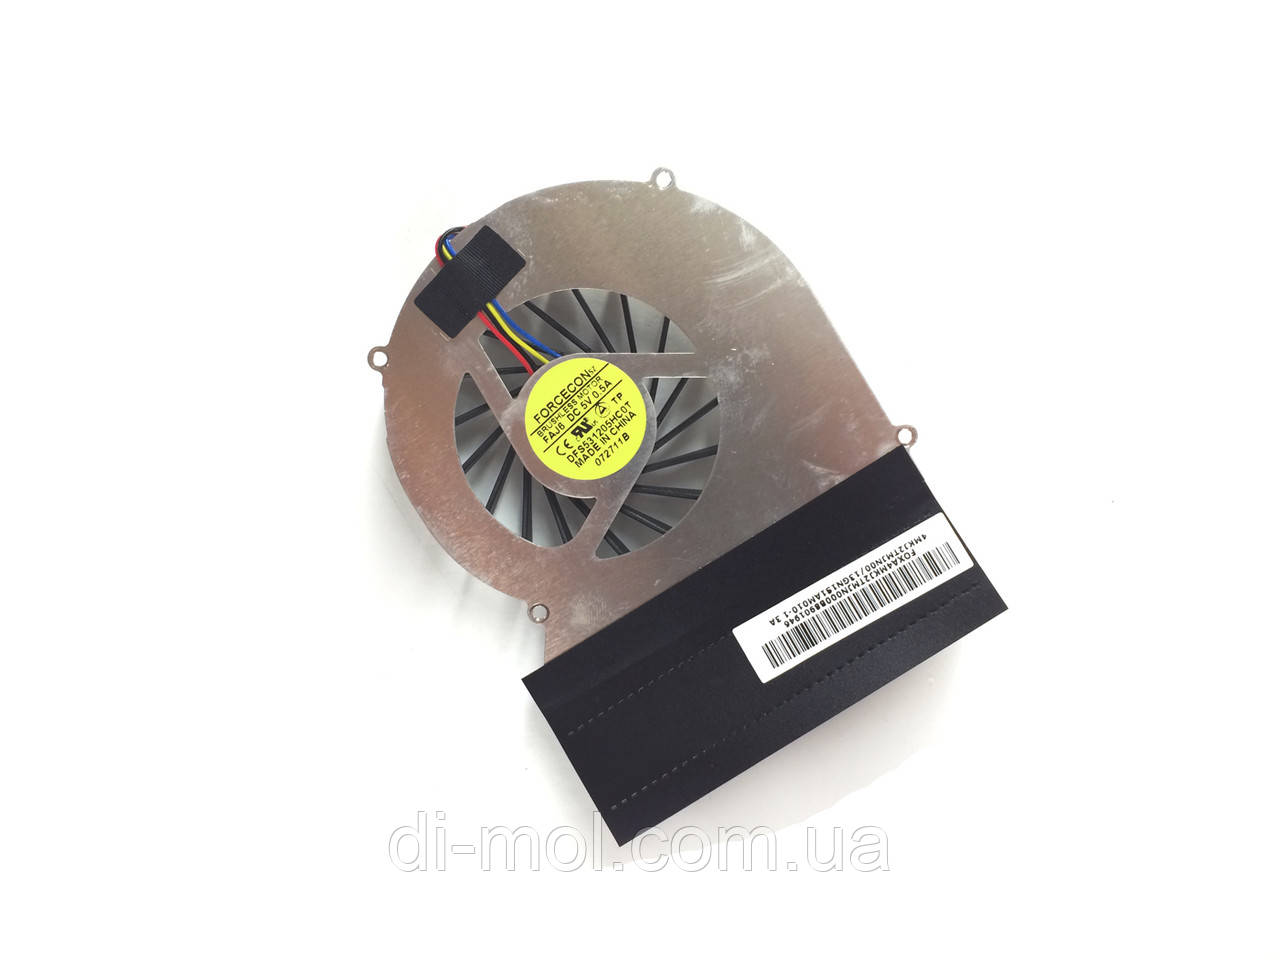 Вентилятор для ноутбука Asus N43 series, 4-pin